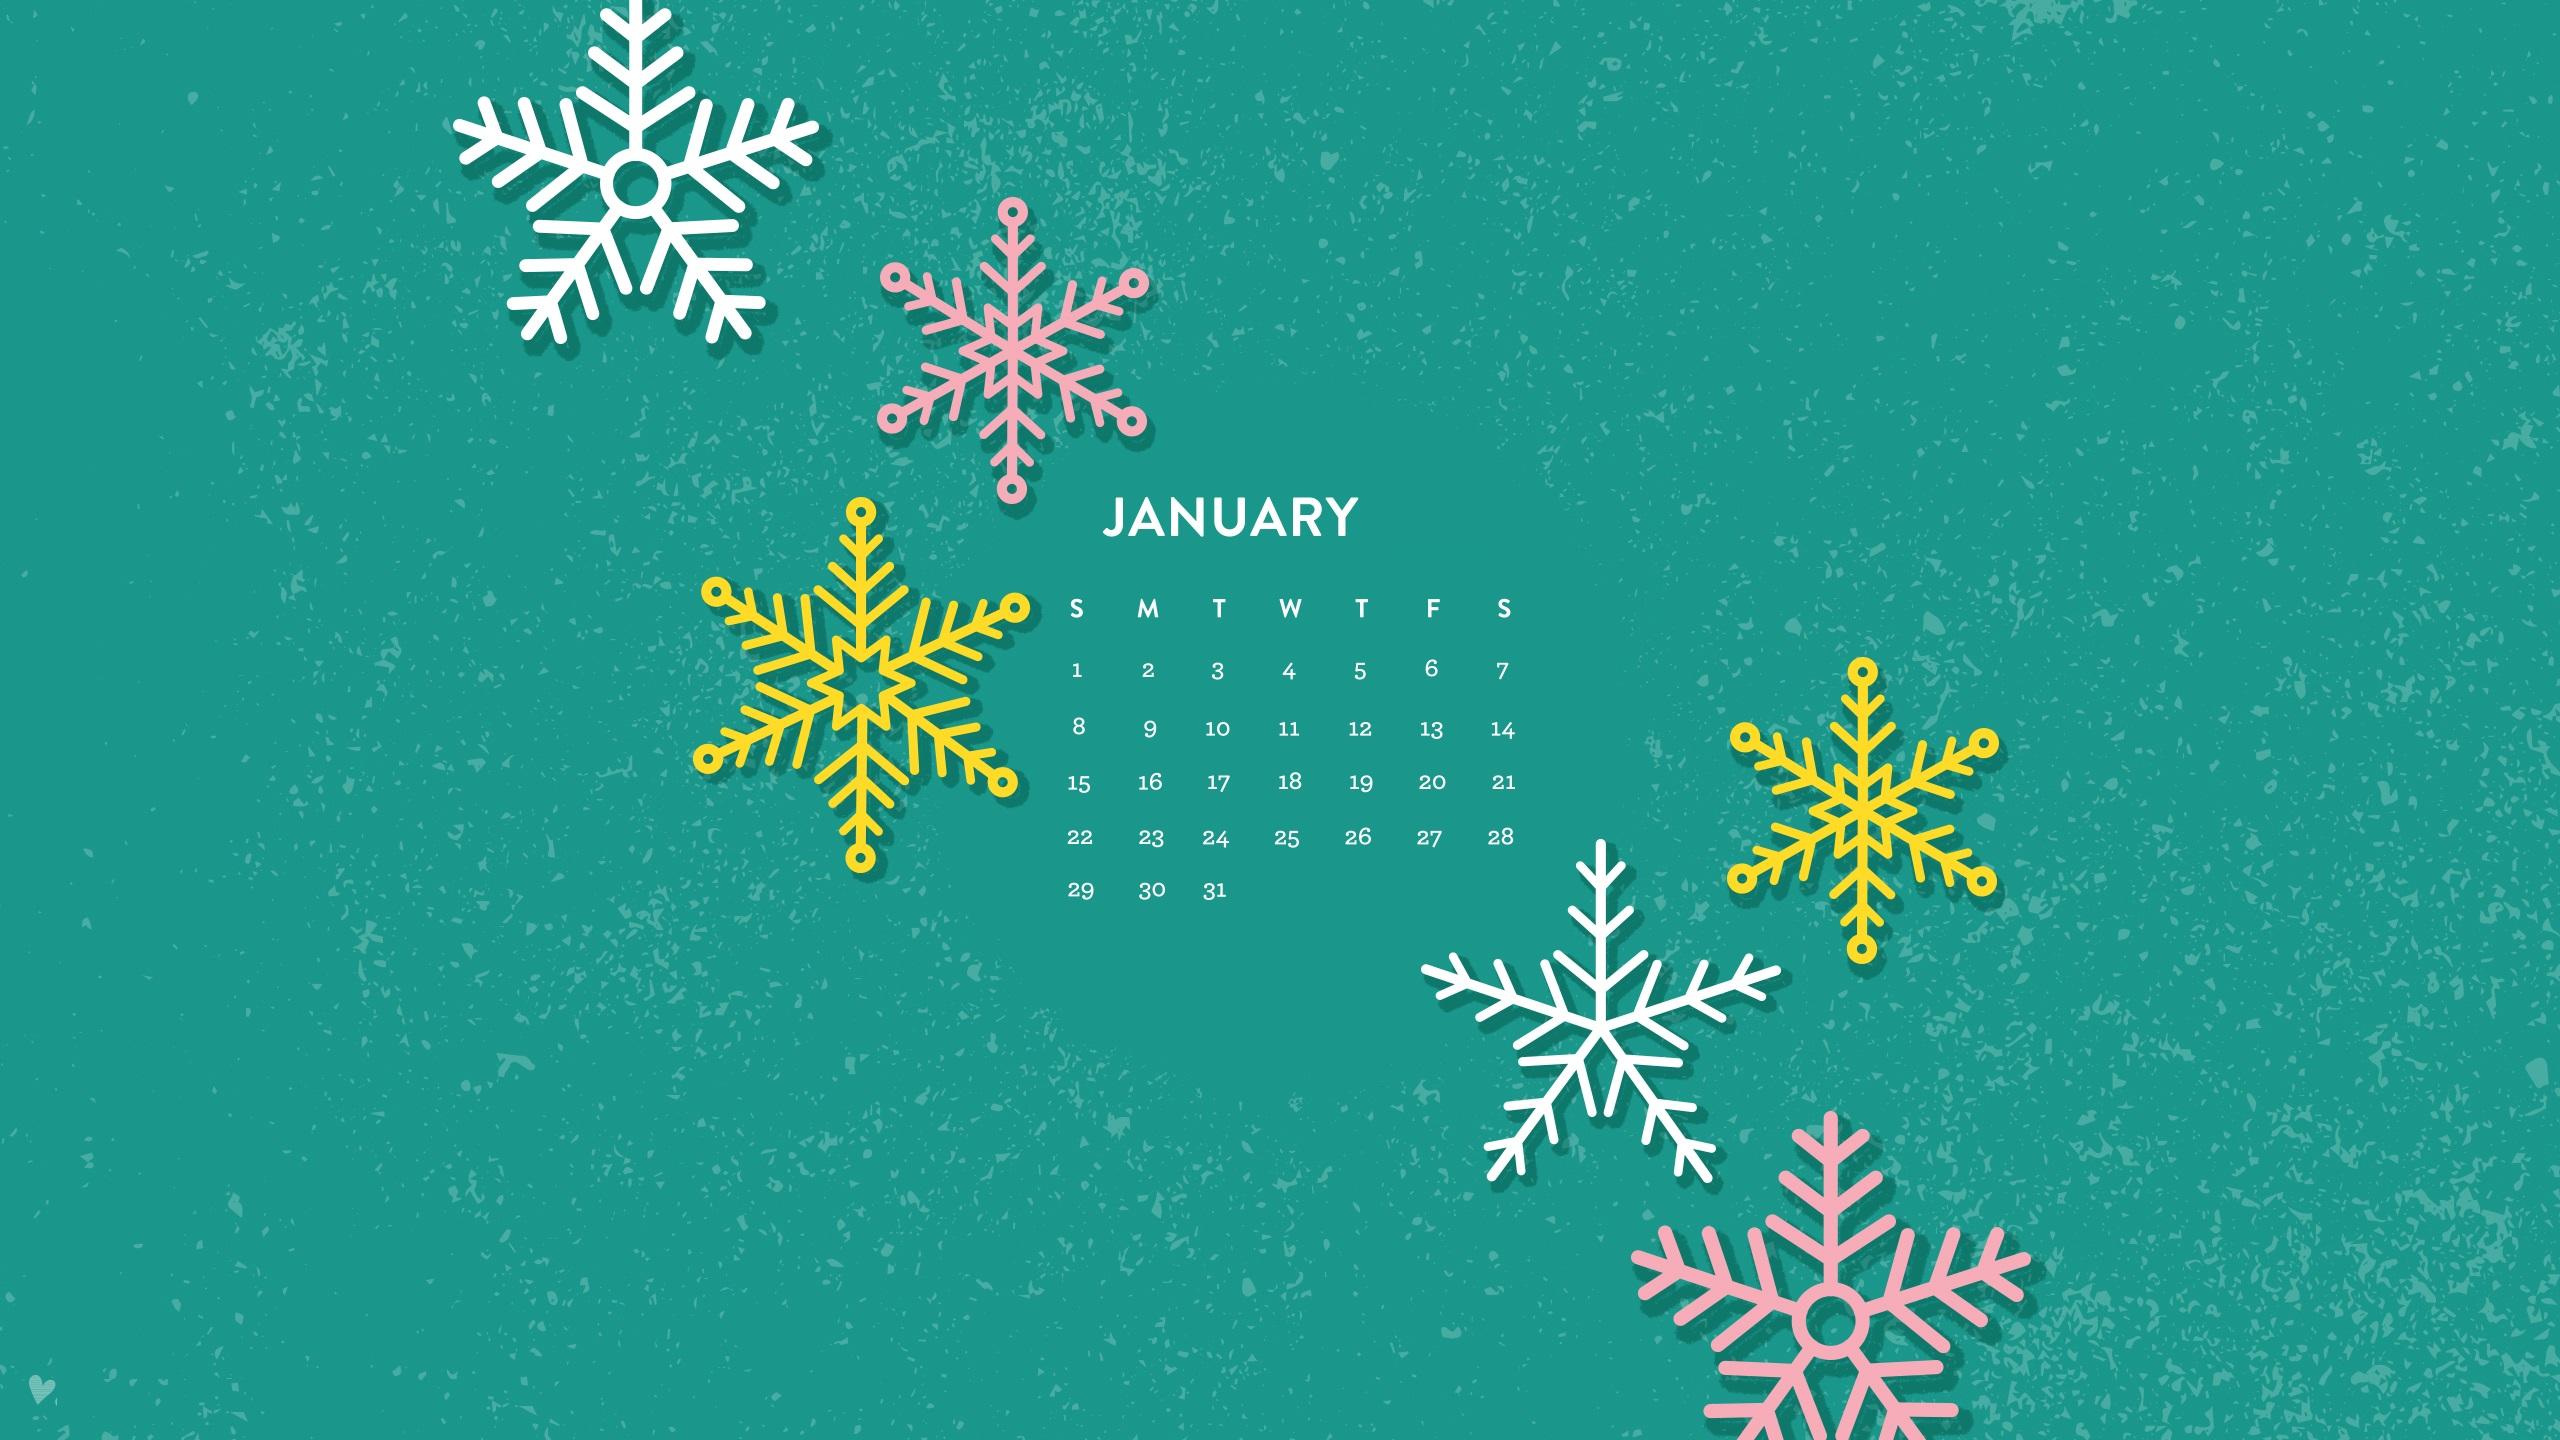 January 2019 HD Calendar Wallpapers Latest Calendar 2560x1440